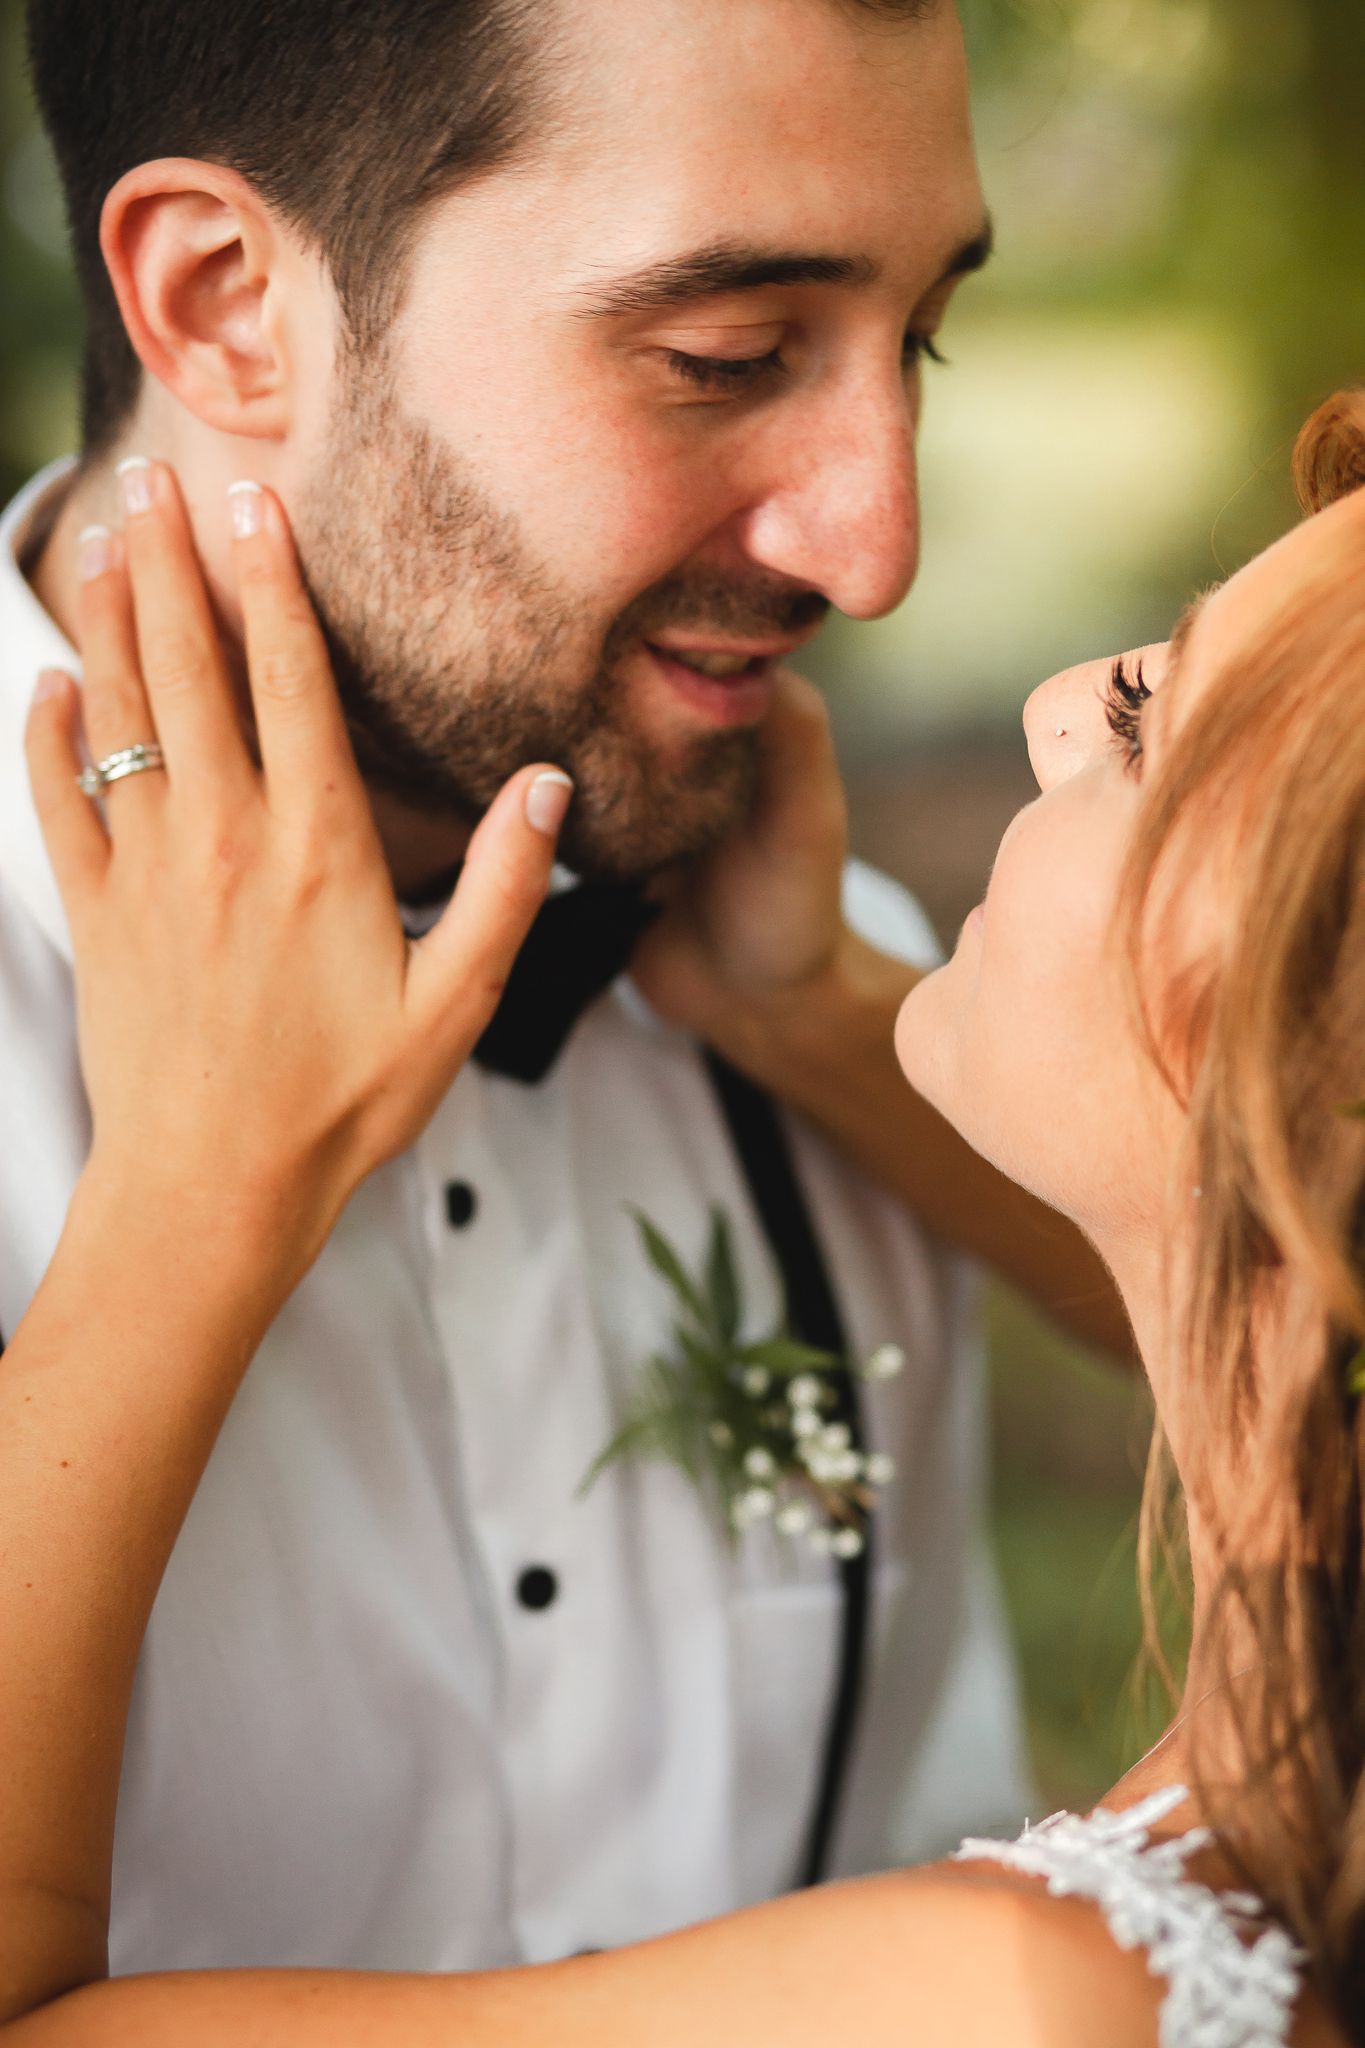 Amy D Photography- Bride and Groom- Wedding Poses- Muskoka Wedding- Barrie Wedding Photographer- Best Wedding Photographer- Muskoka Wedding Photography- Bride Pose- Groom Pose-6.jpg